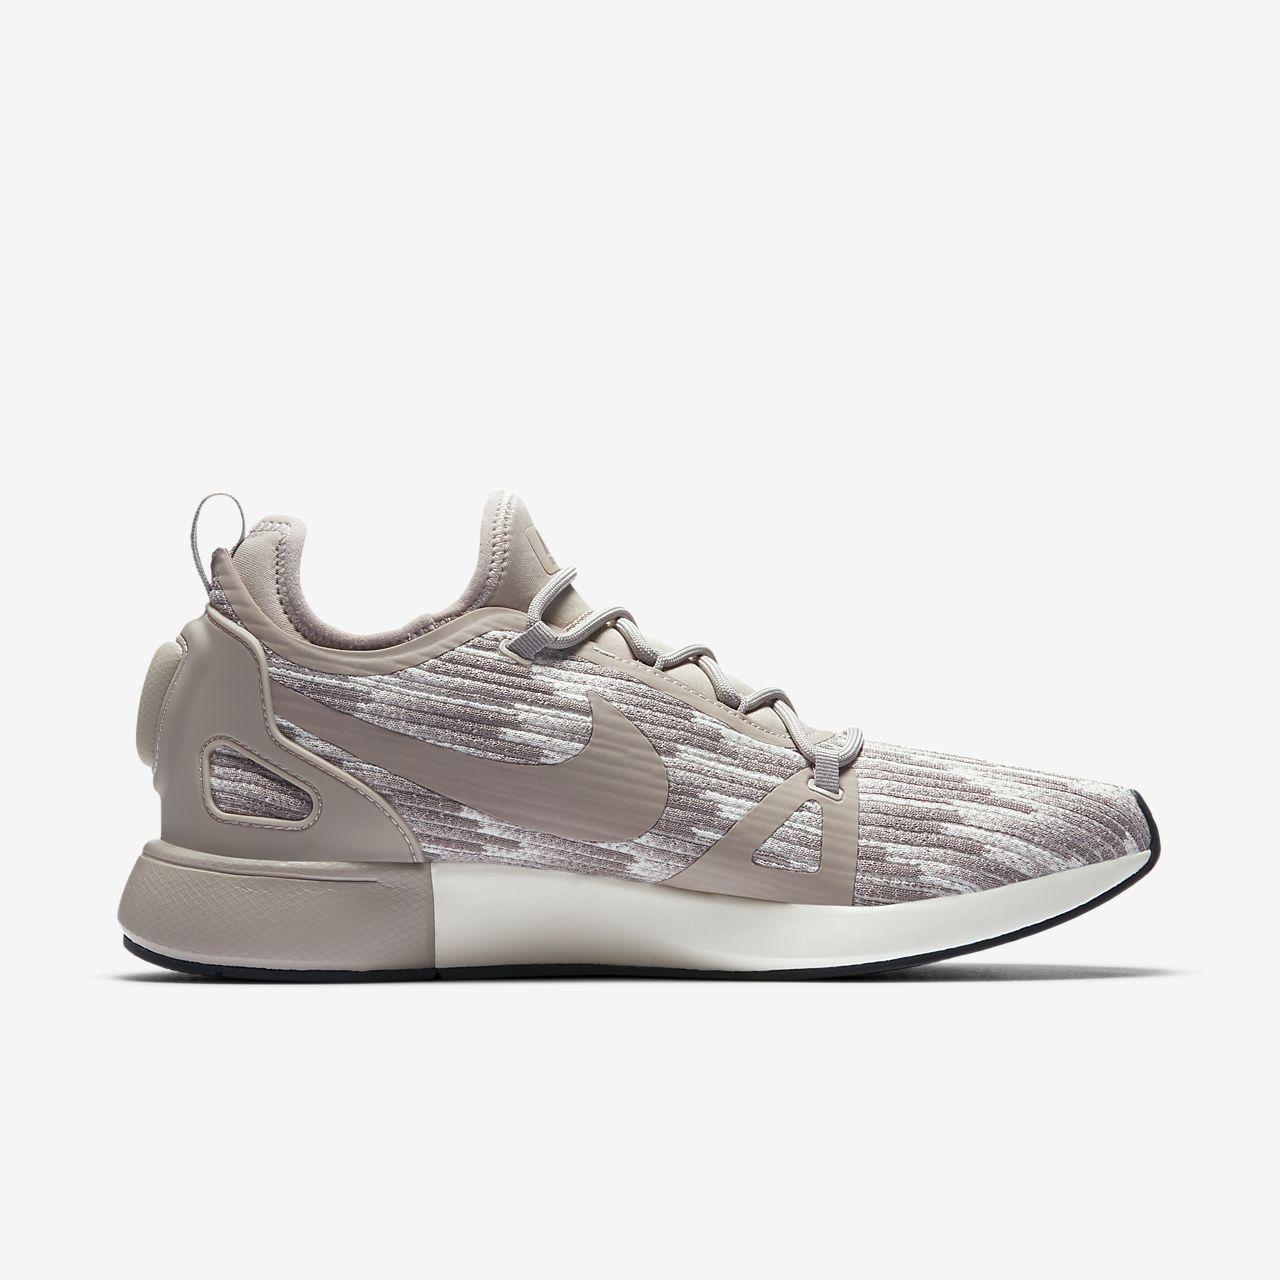 ... Nike Duel Racer SE Men's Shoe